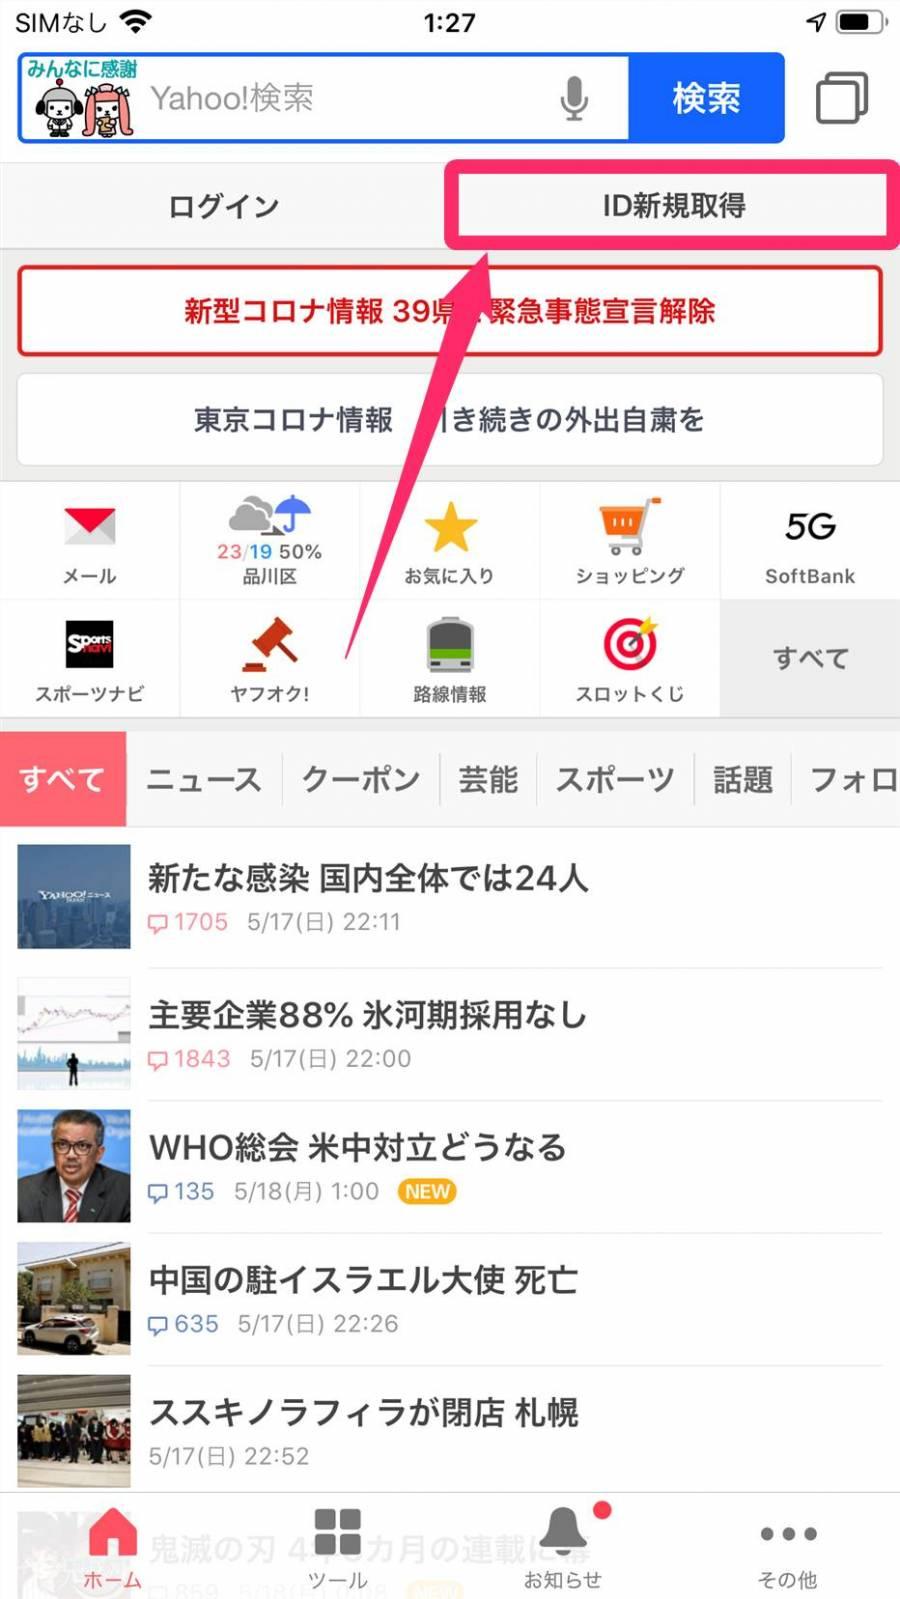 『Yahoo!』アプリホーム画面